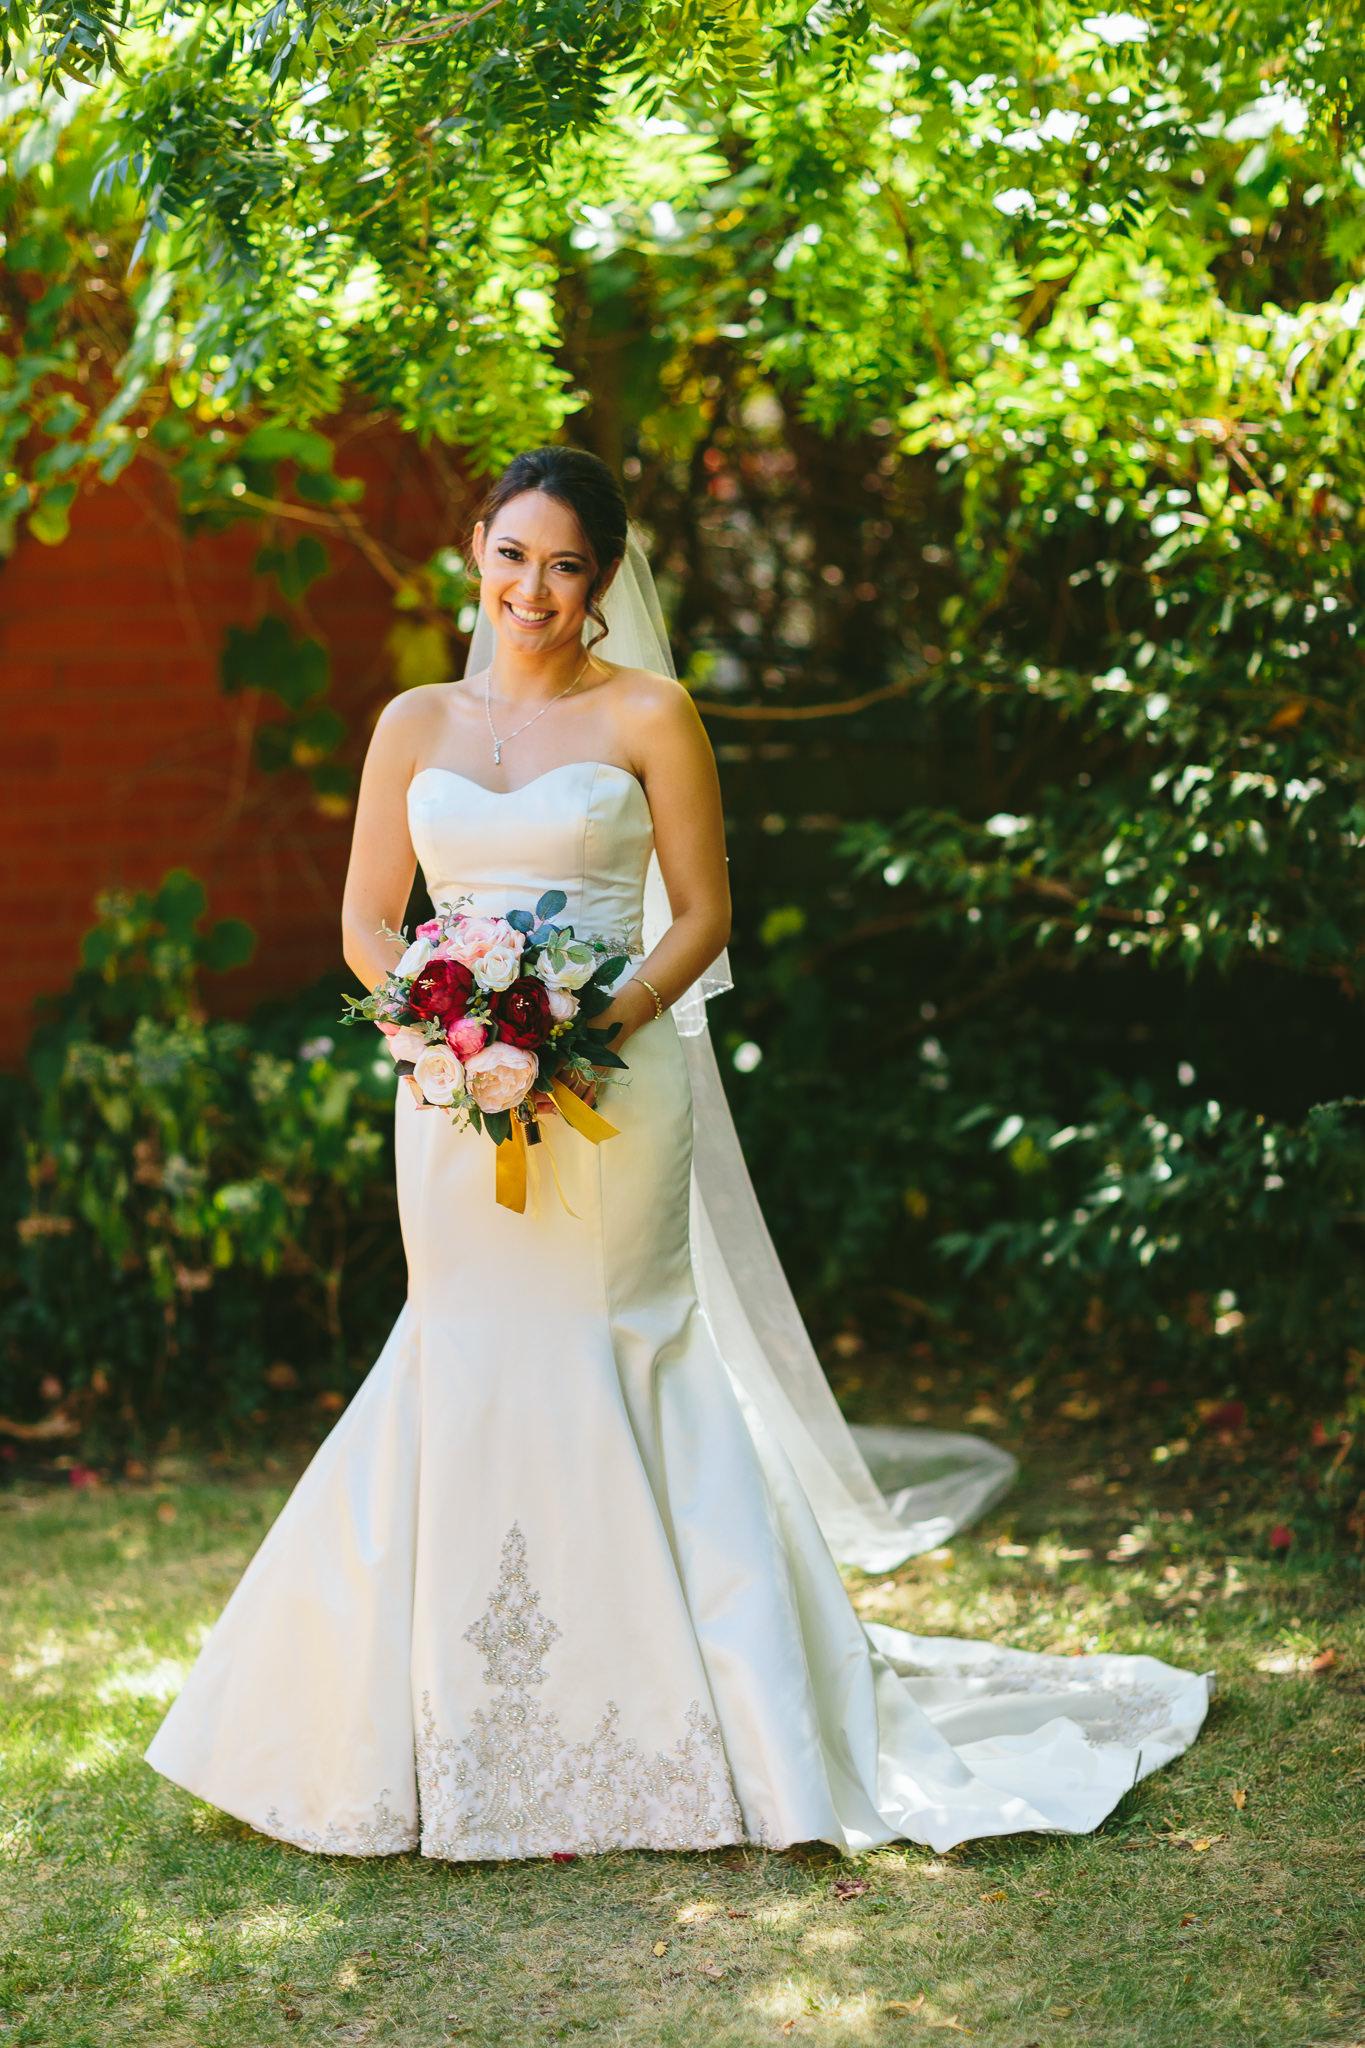 Bride with berry color bouquet